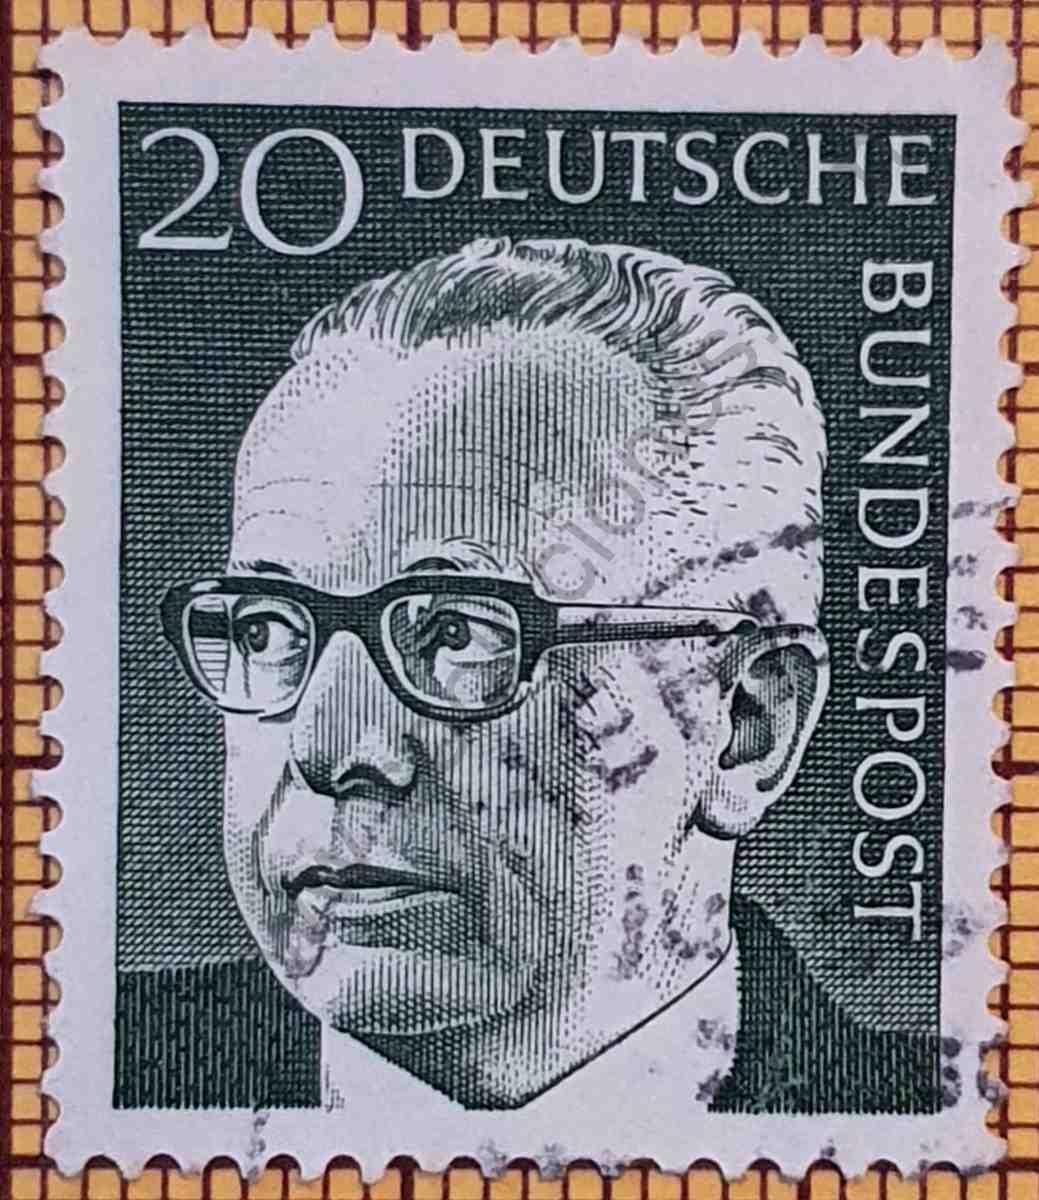 Dr. Gustav Heinemann 20Pf - Sello de Alemania año 1970